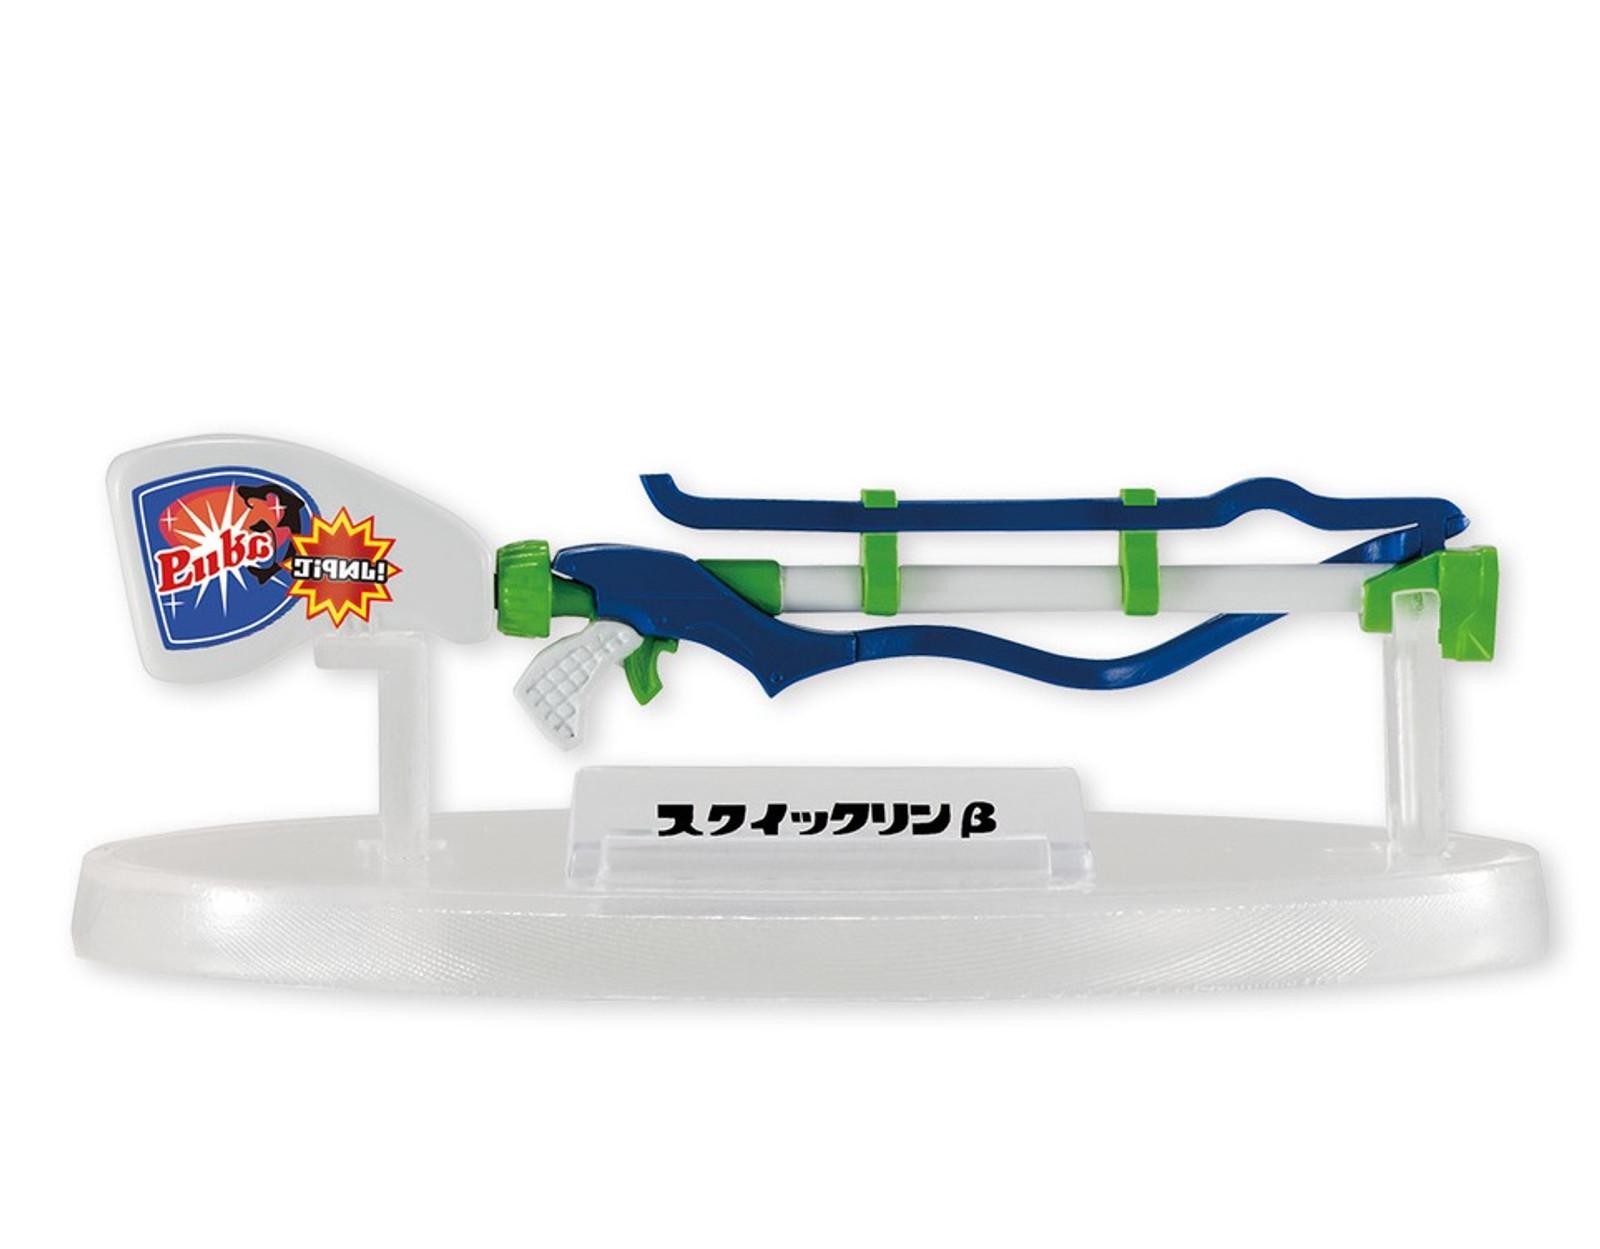 Splatoon 2 New Squiffer Weapon Figure Collection JAPAN Nintendo Switch 2